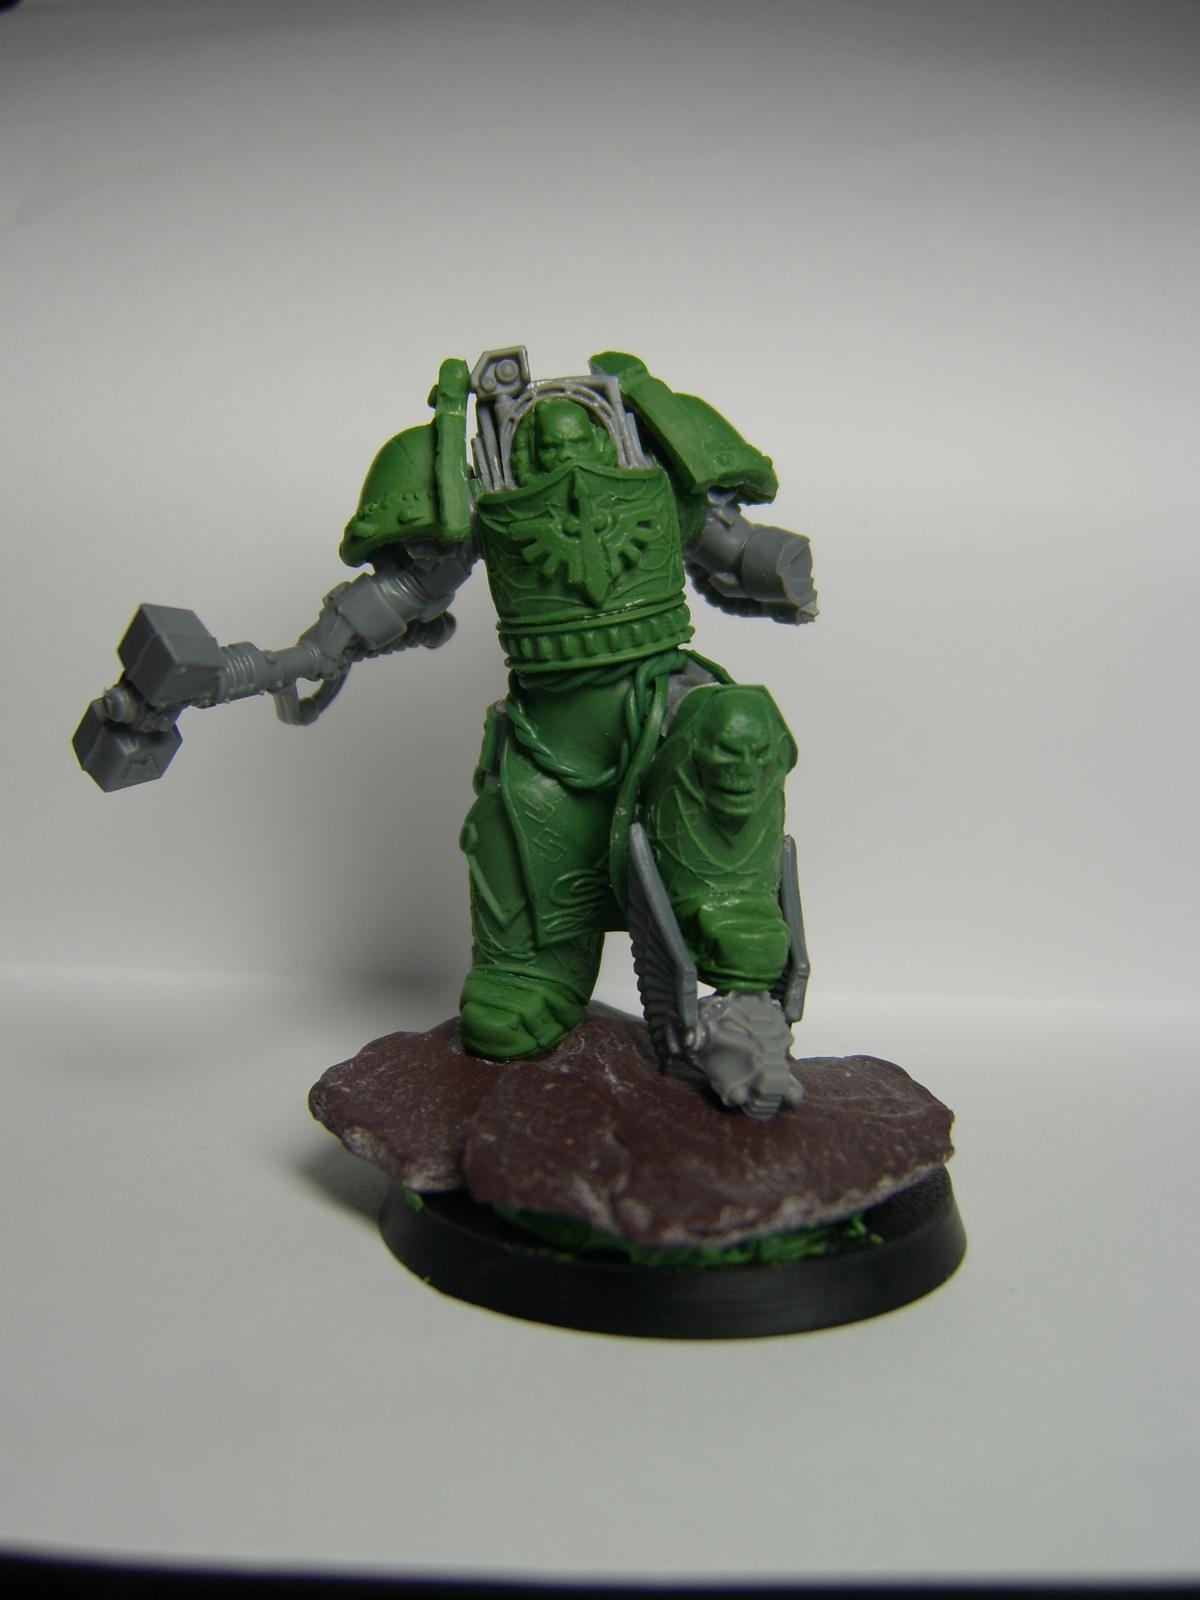 Dark Angels, Deathwing, Greenstuff, Space Marines, Terminator Armor